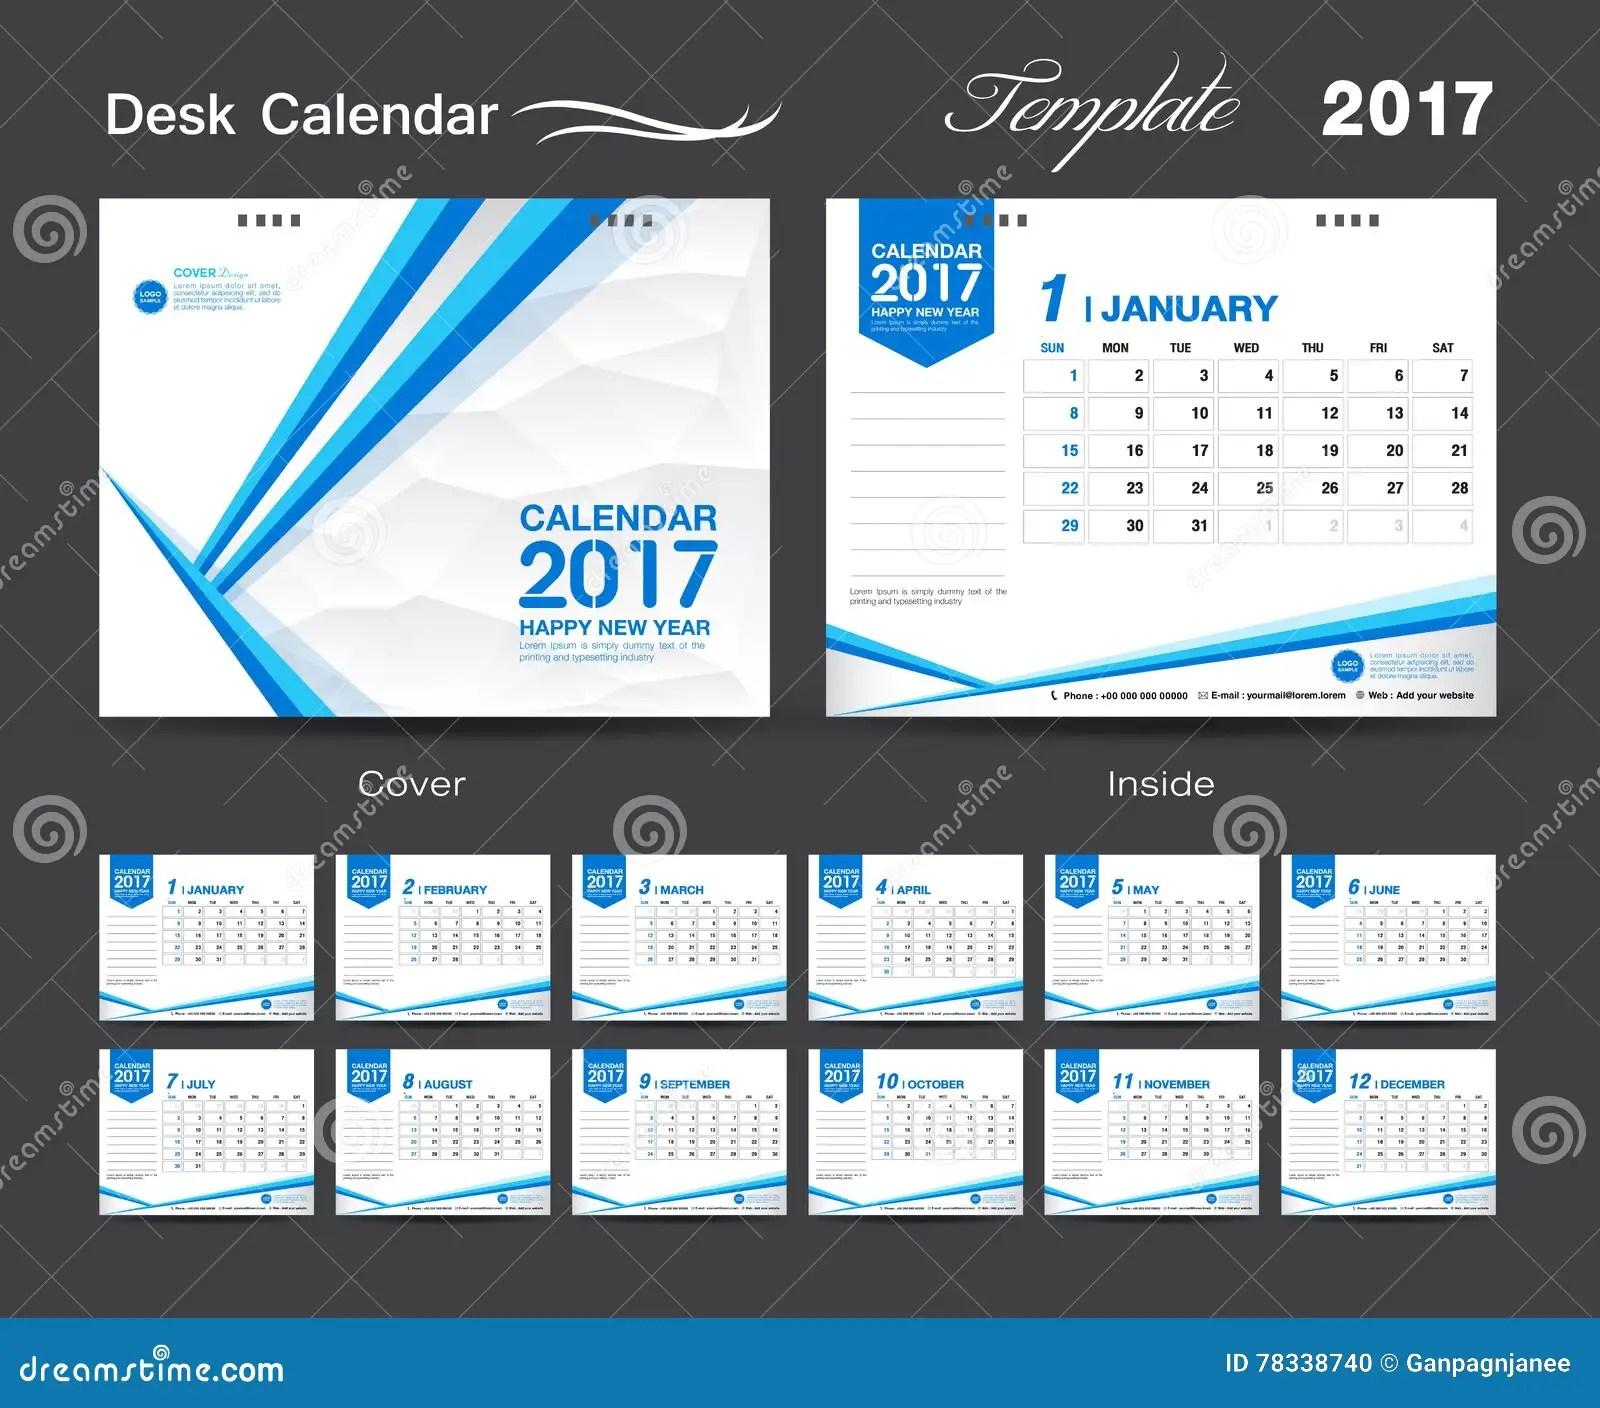 Set Desk Calendar 2017 Template Design Cover Desk Calendar Stock Illustration Image 78338740